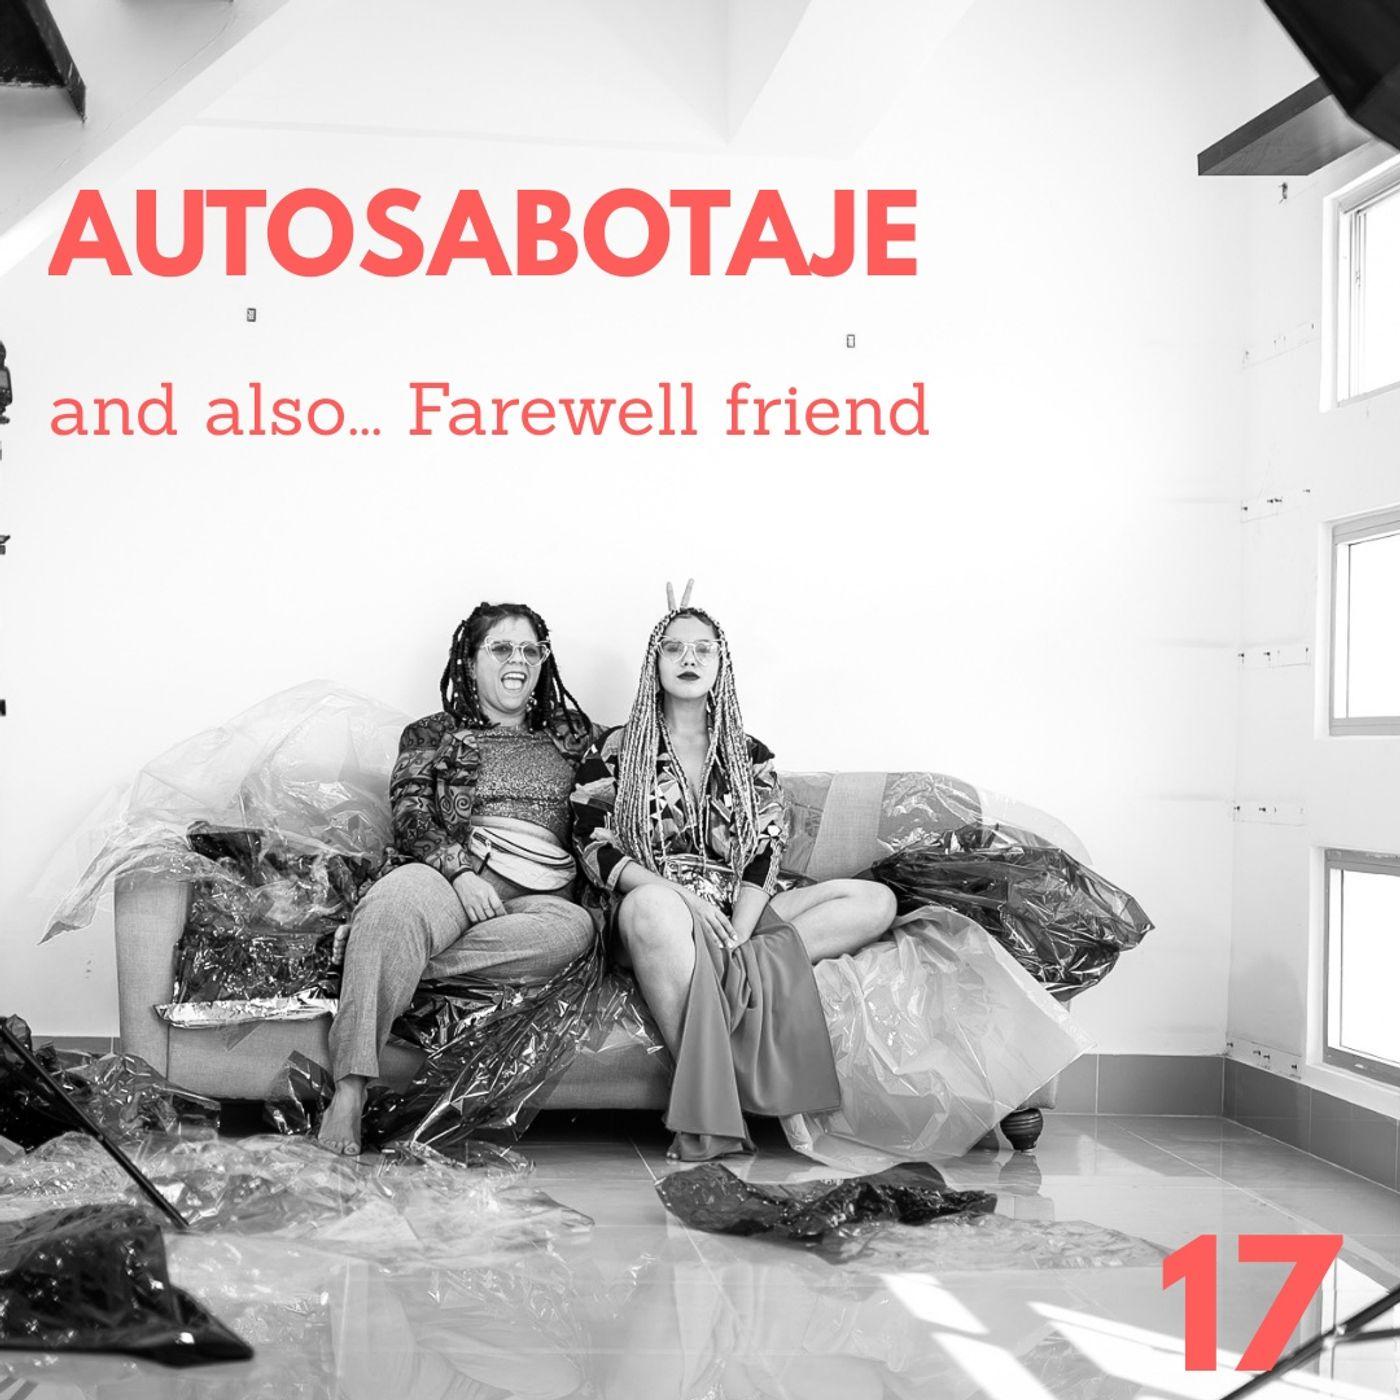 AUTOSABOTAJE... and farewell friend